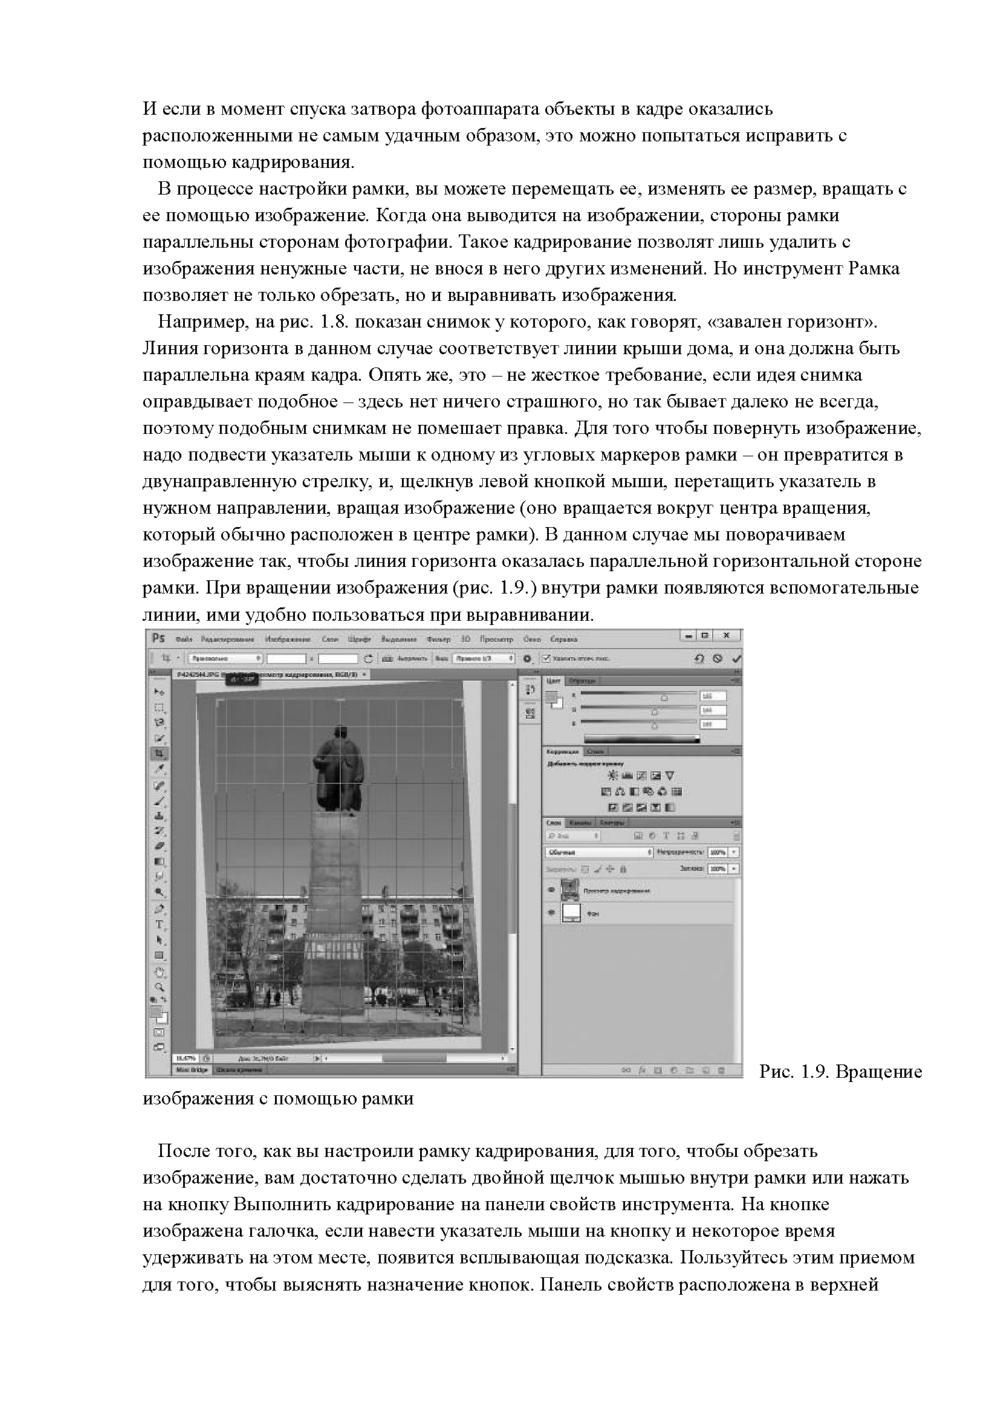 http://i4.imageban.ru/out/2013/11/28/3712d28fc7a929a128c95783d5aa7a5b.jpg